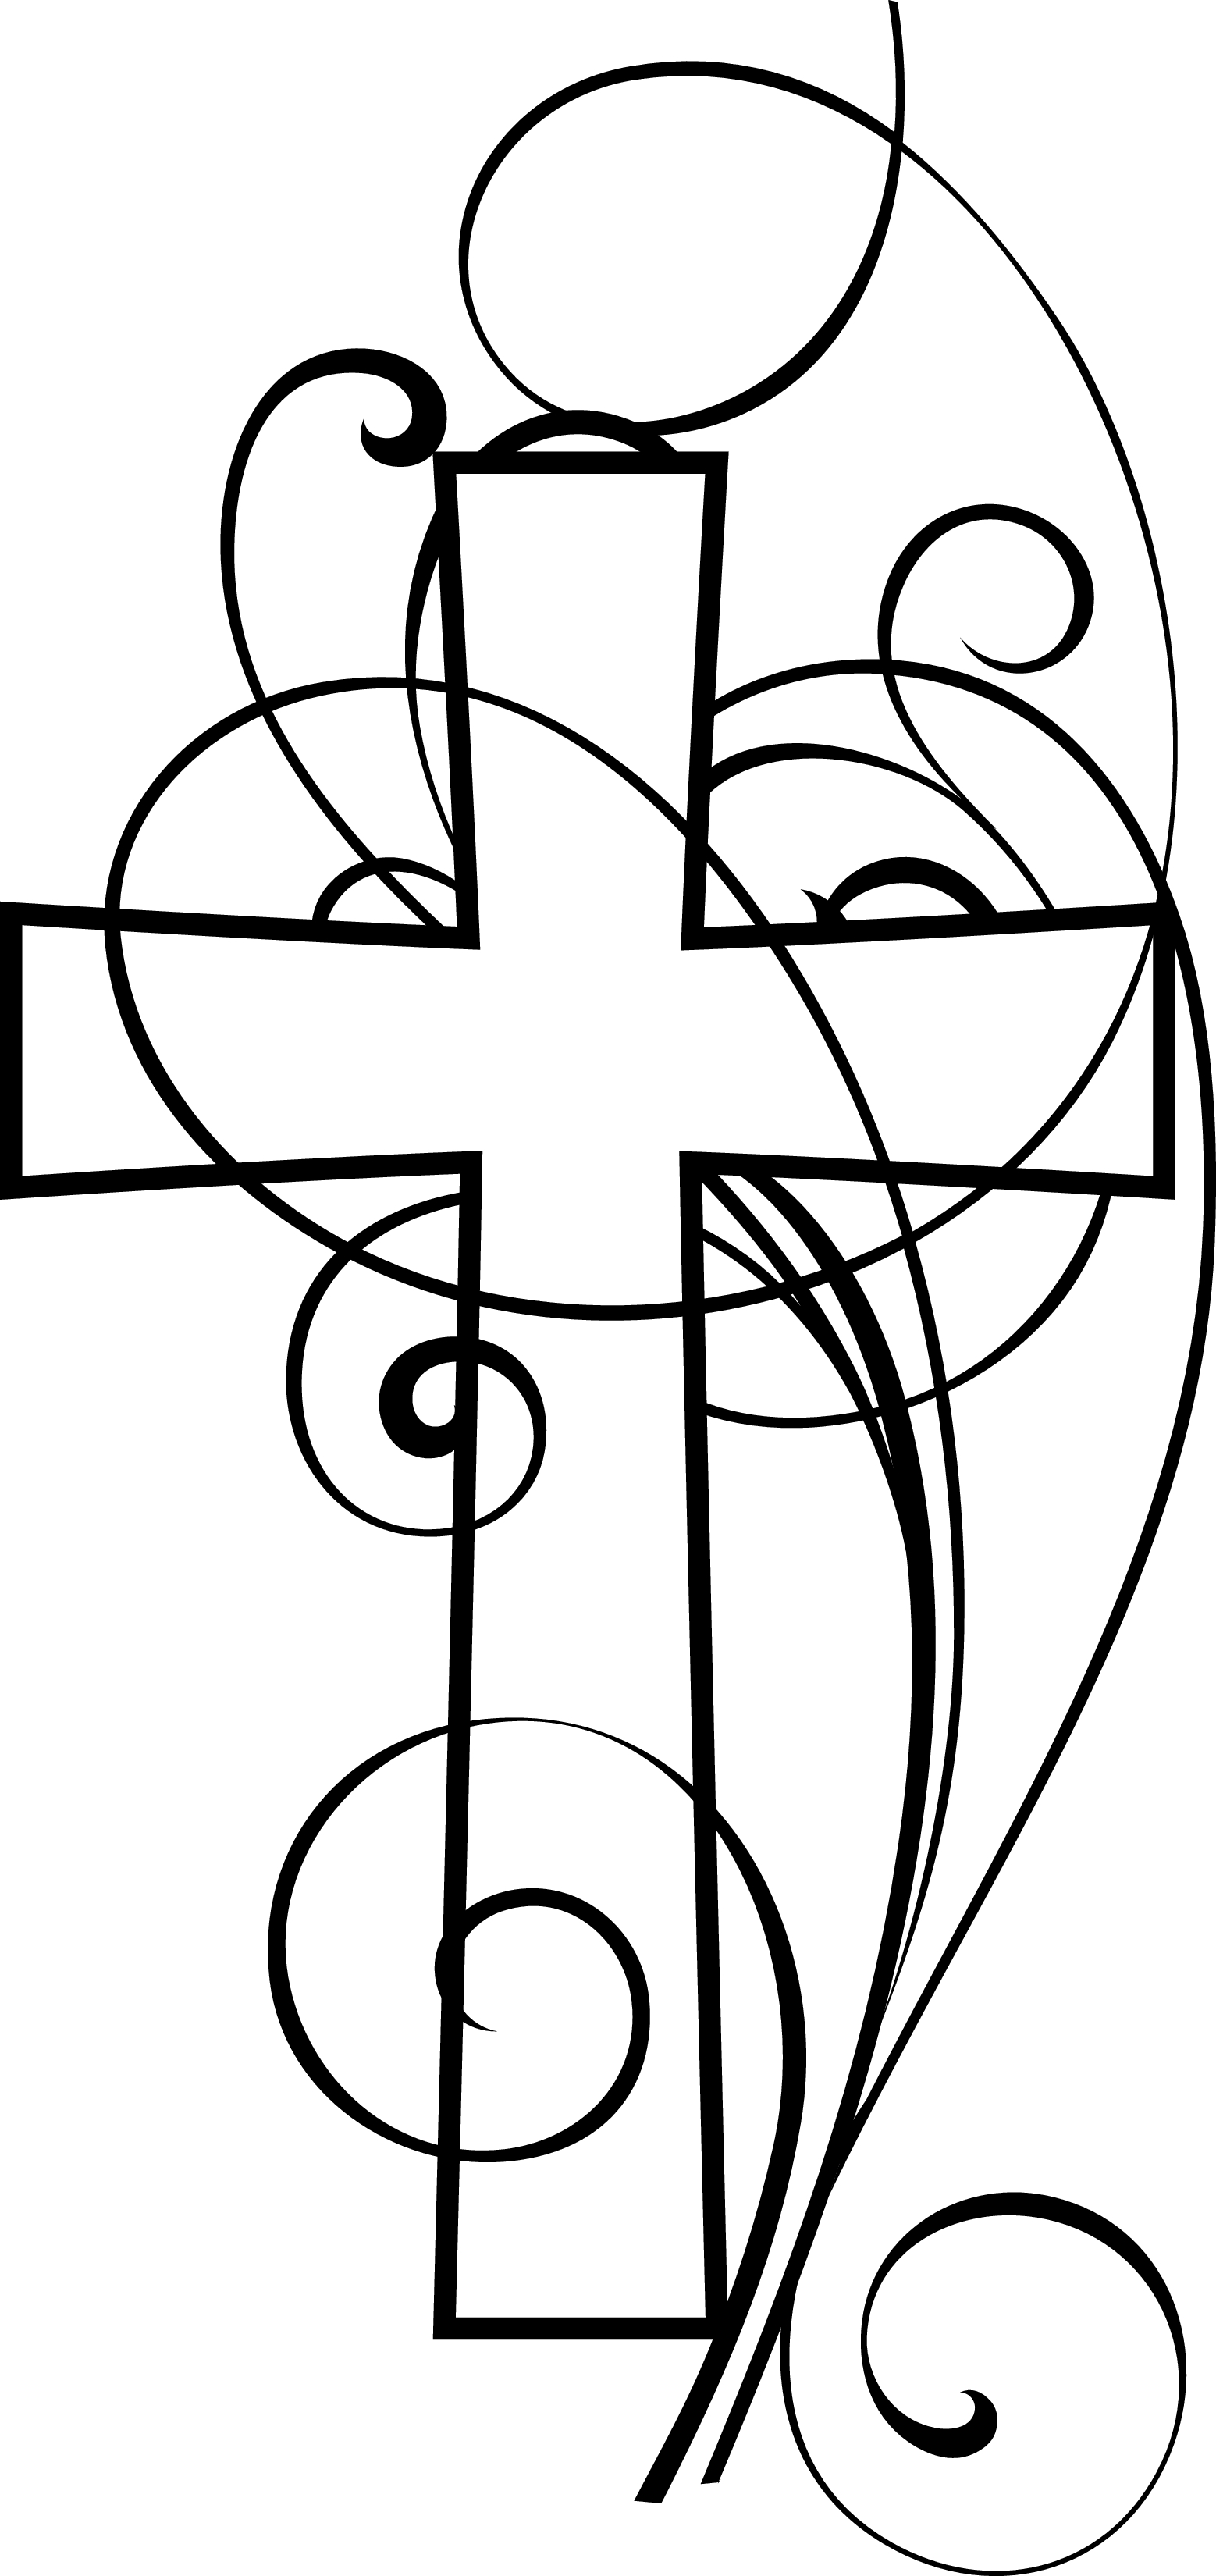 Catholic Cross Clip Art Clipart Panda Free Clipart Images